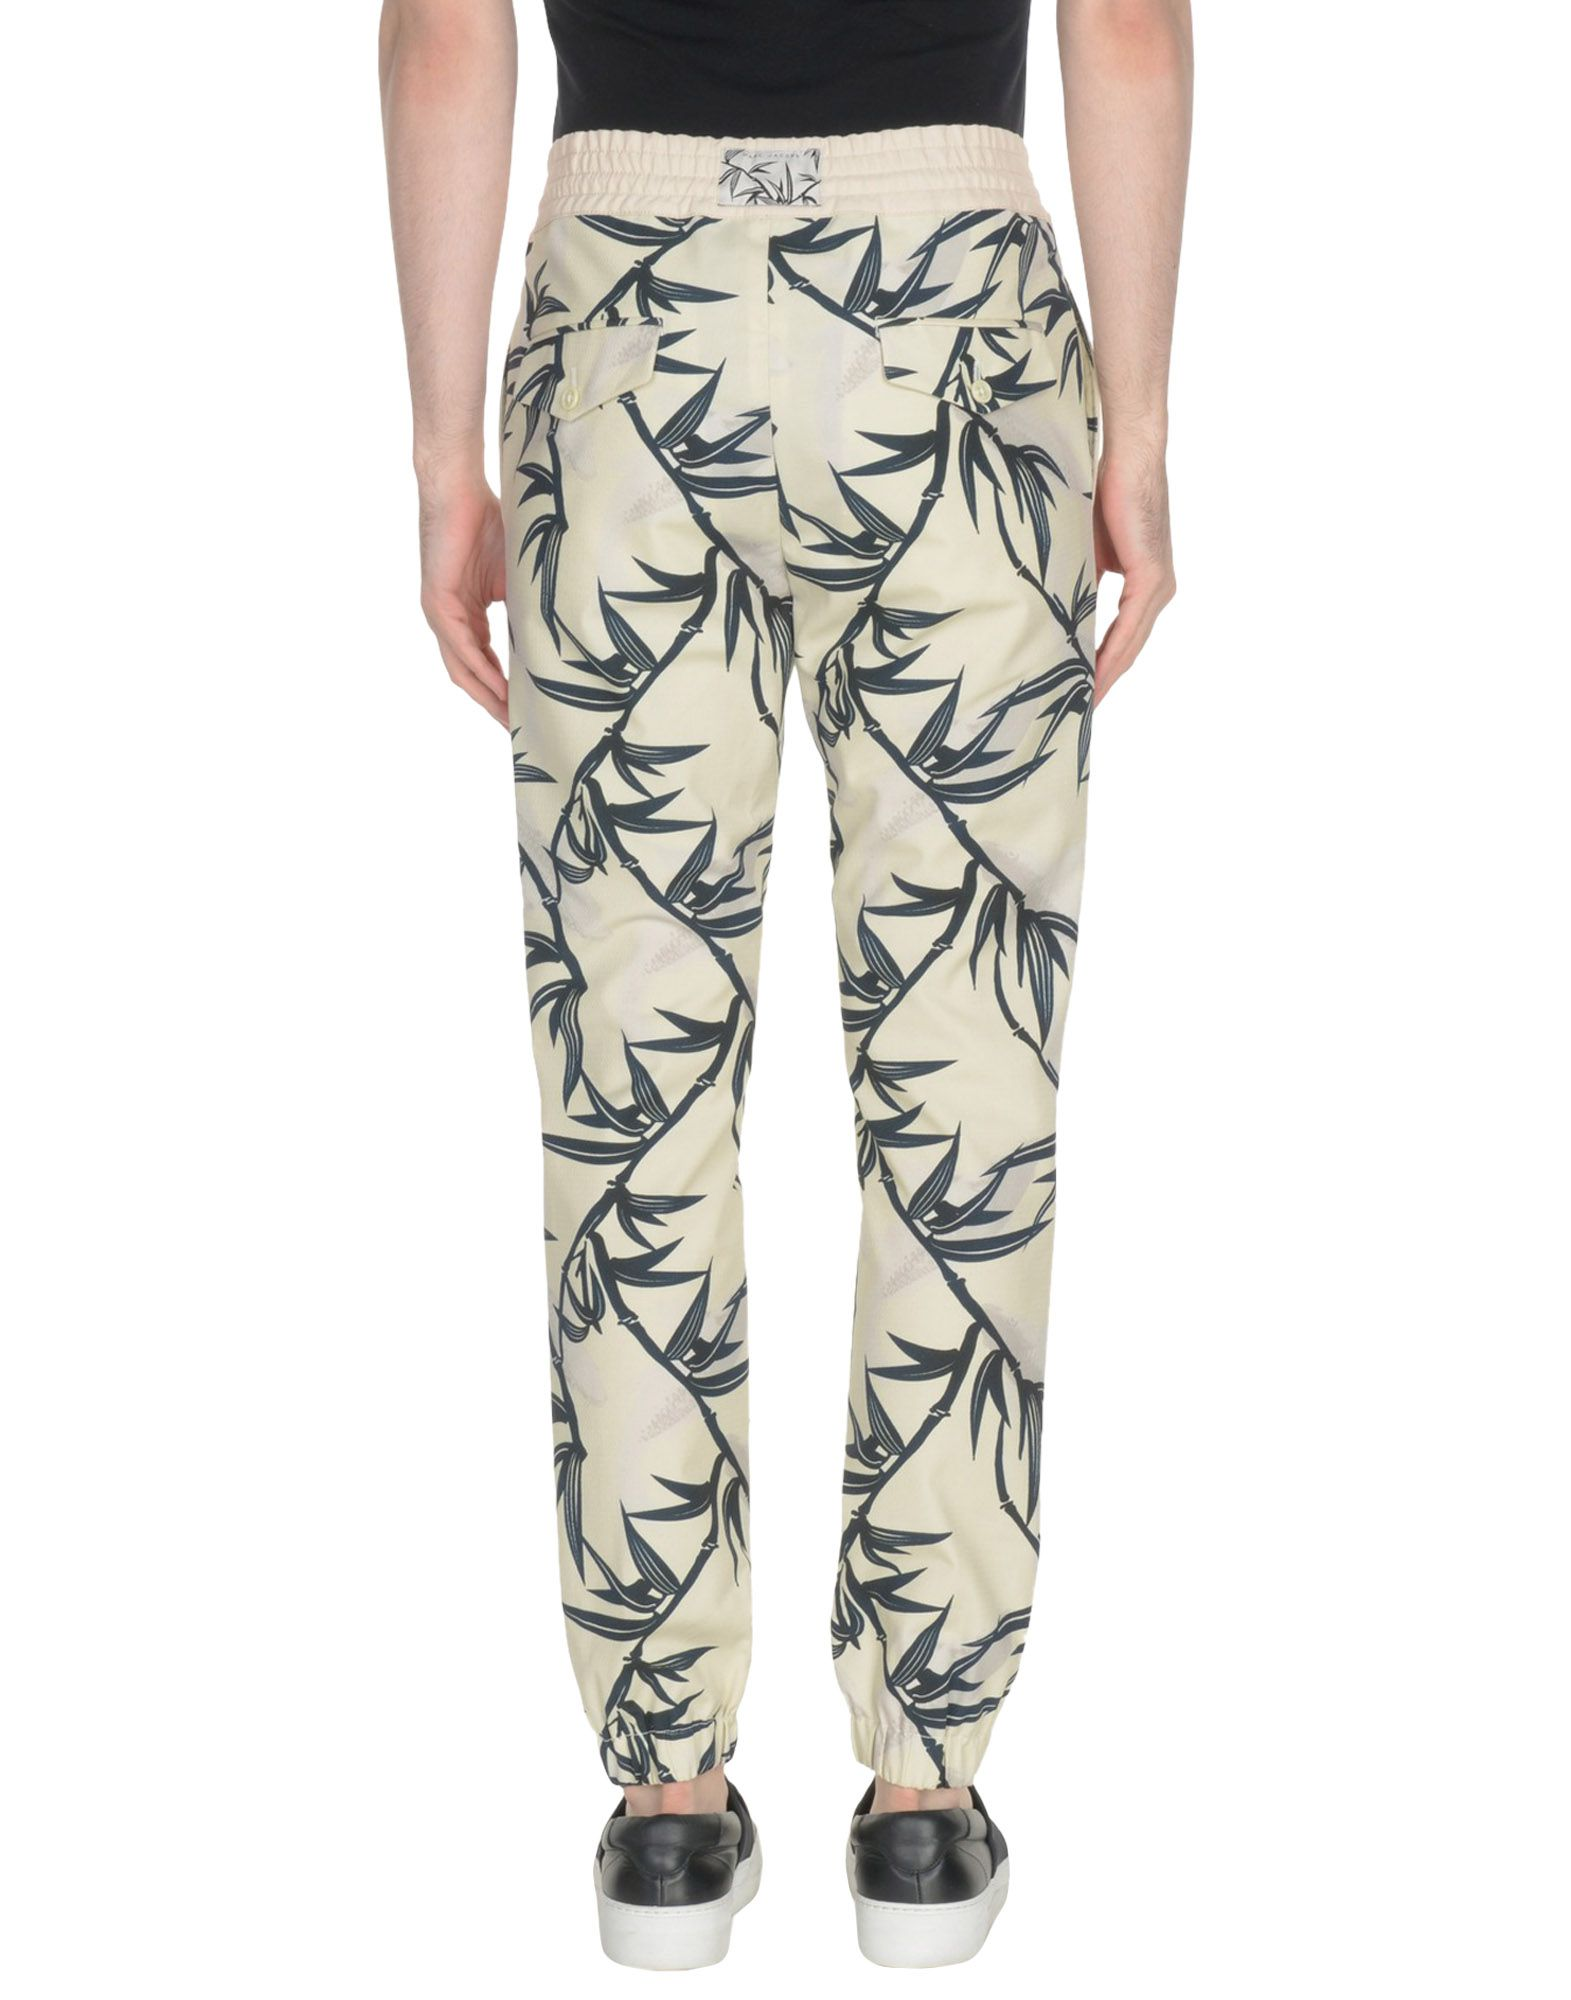 Pantalone Pantalone Pantalone Marc Jacobs Uomo - 13103859EH 3b586f